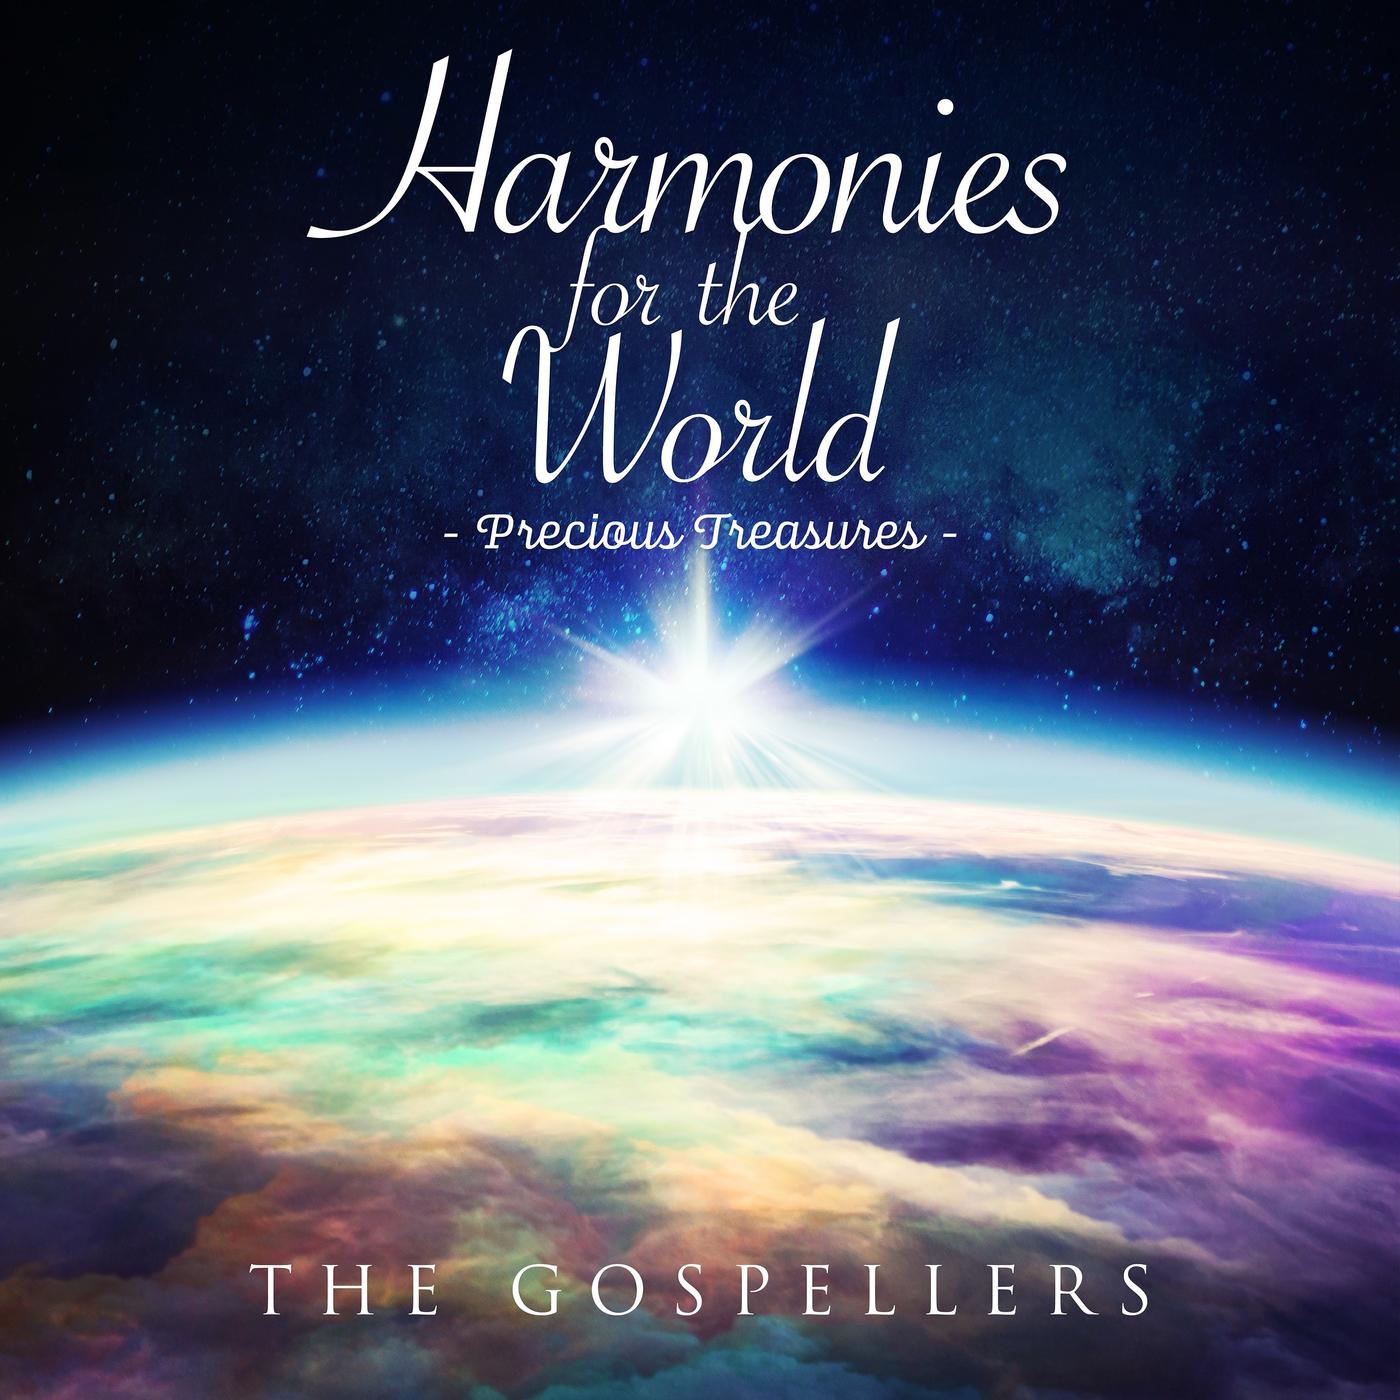 Harmonies for the World - Precious Treasures - - The Gospellers